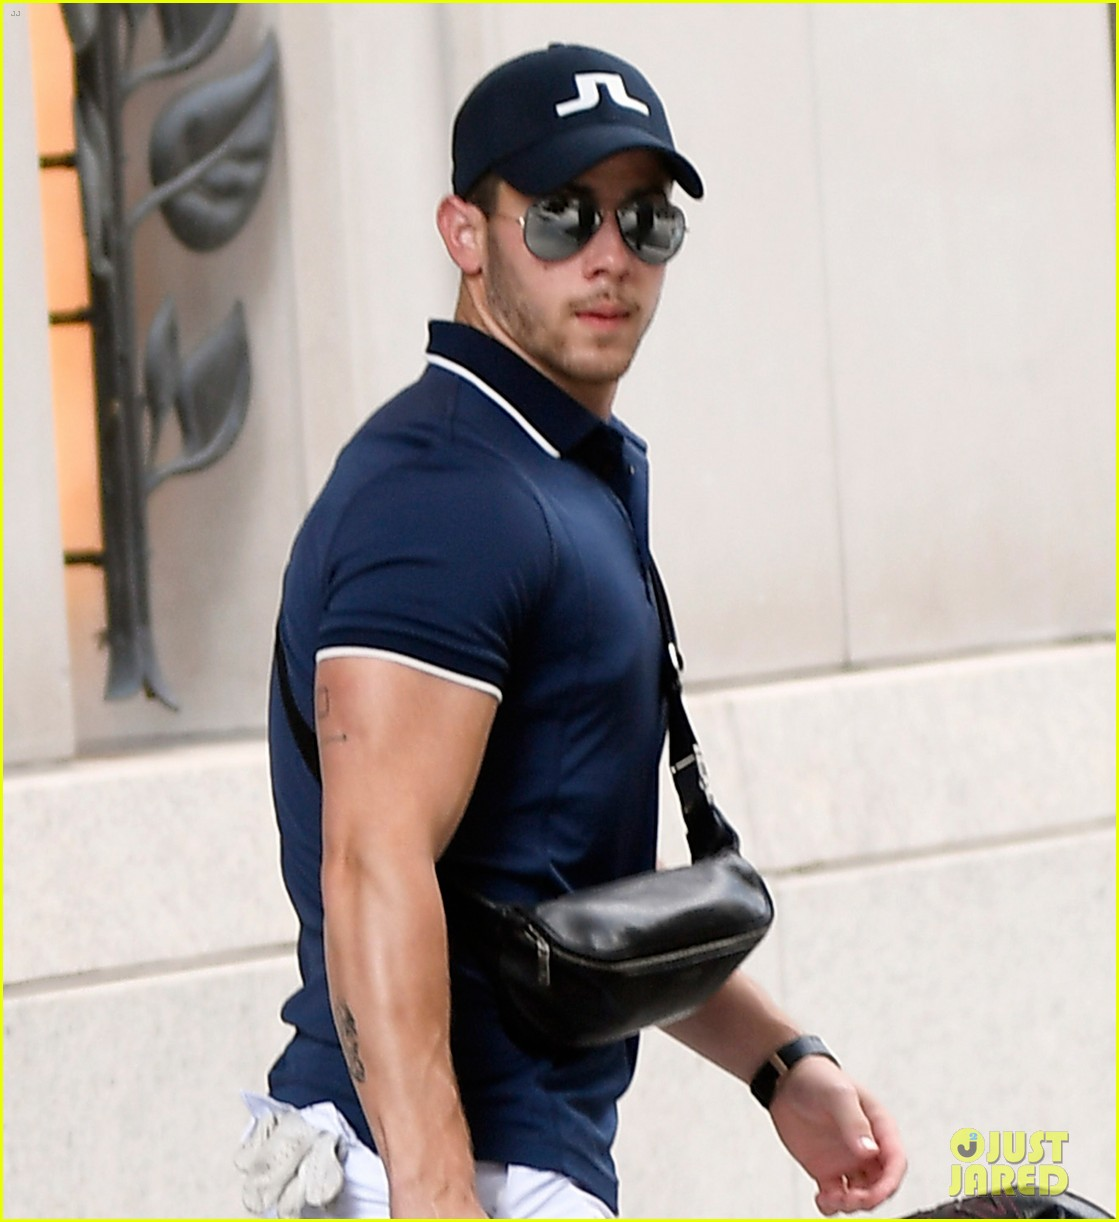 nick jonas looks muscular while heading to play golf 06